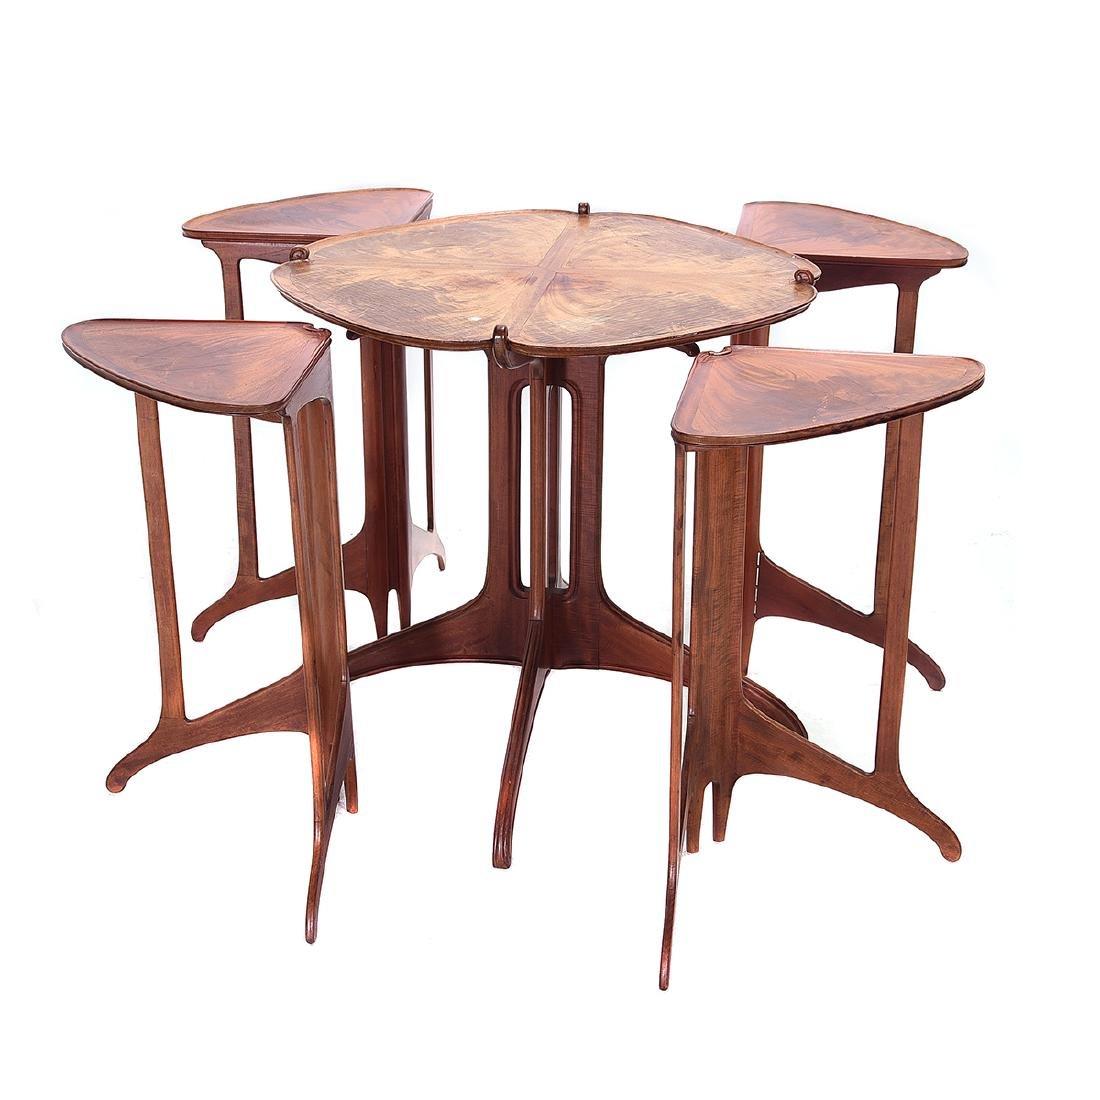 Art Nouveau Style Nest of Five Tables in Teak